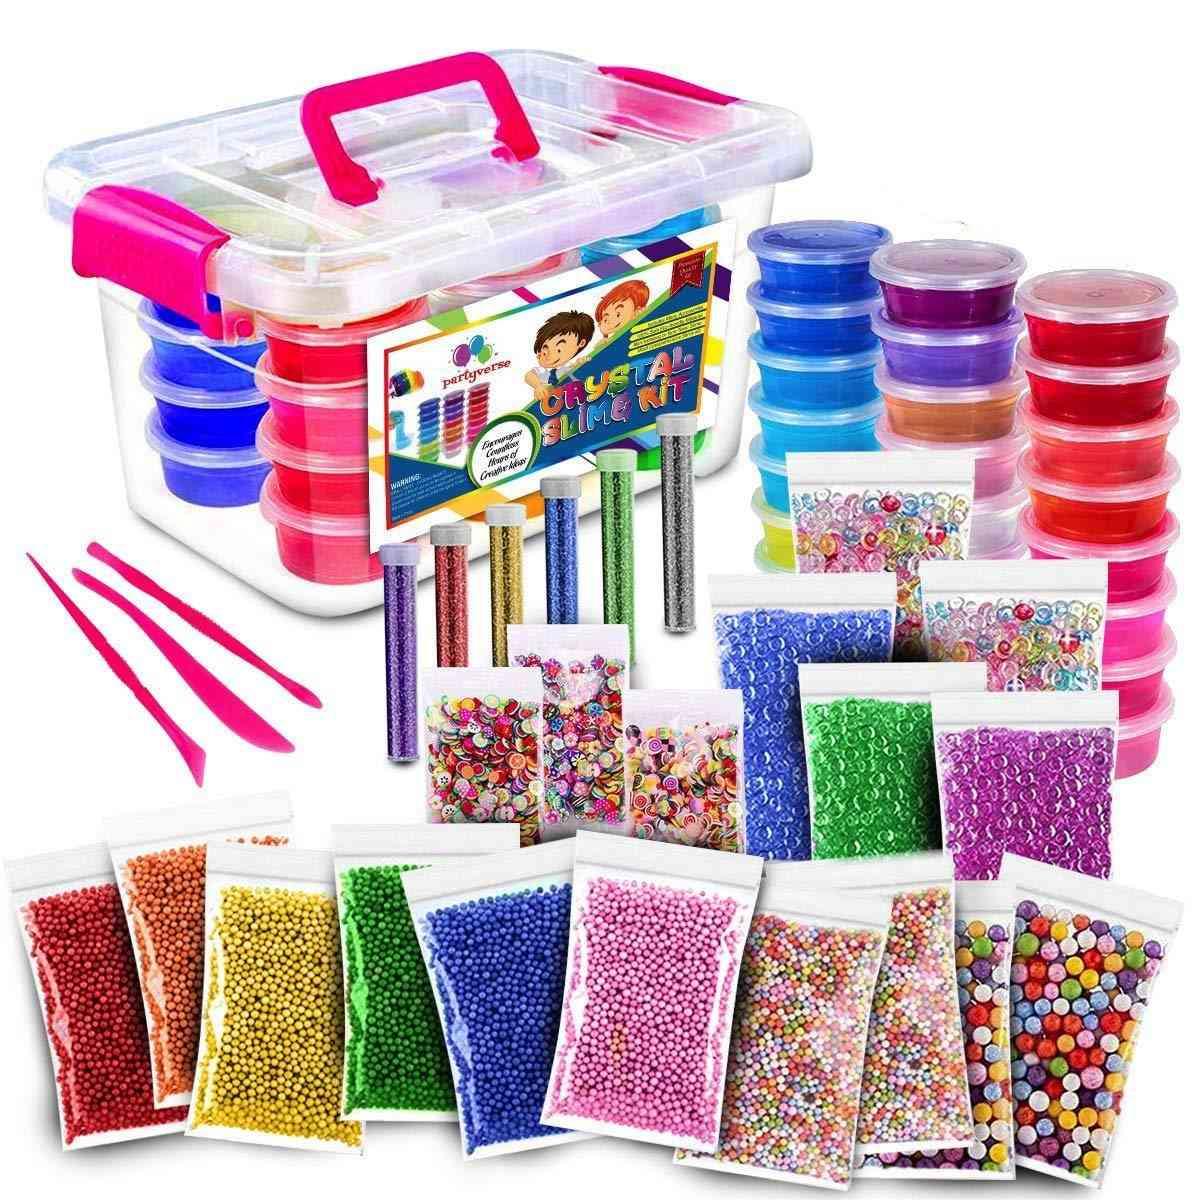 52pack Fluffy 24 Color Slime Kit